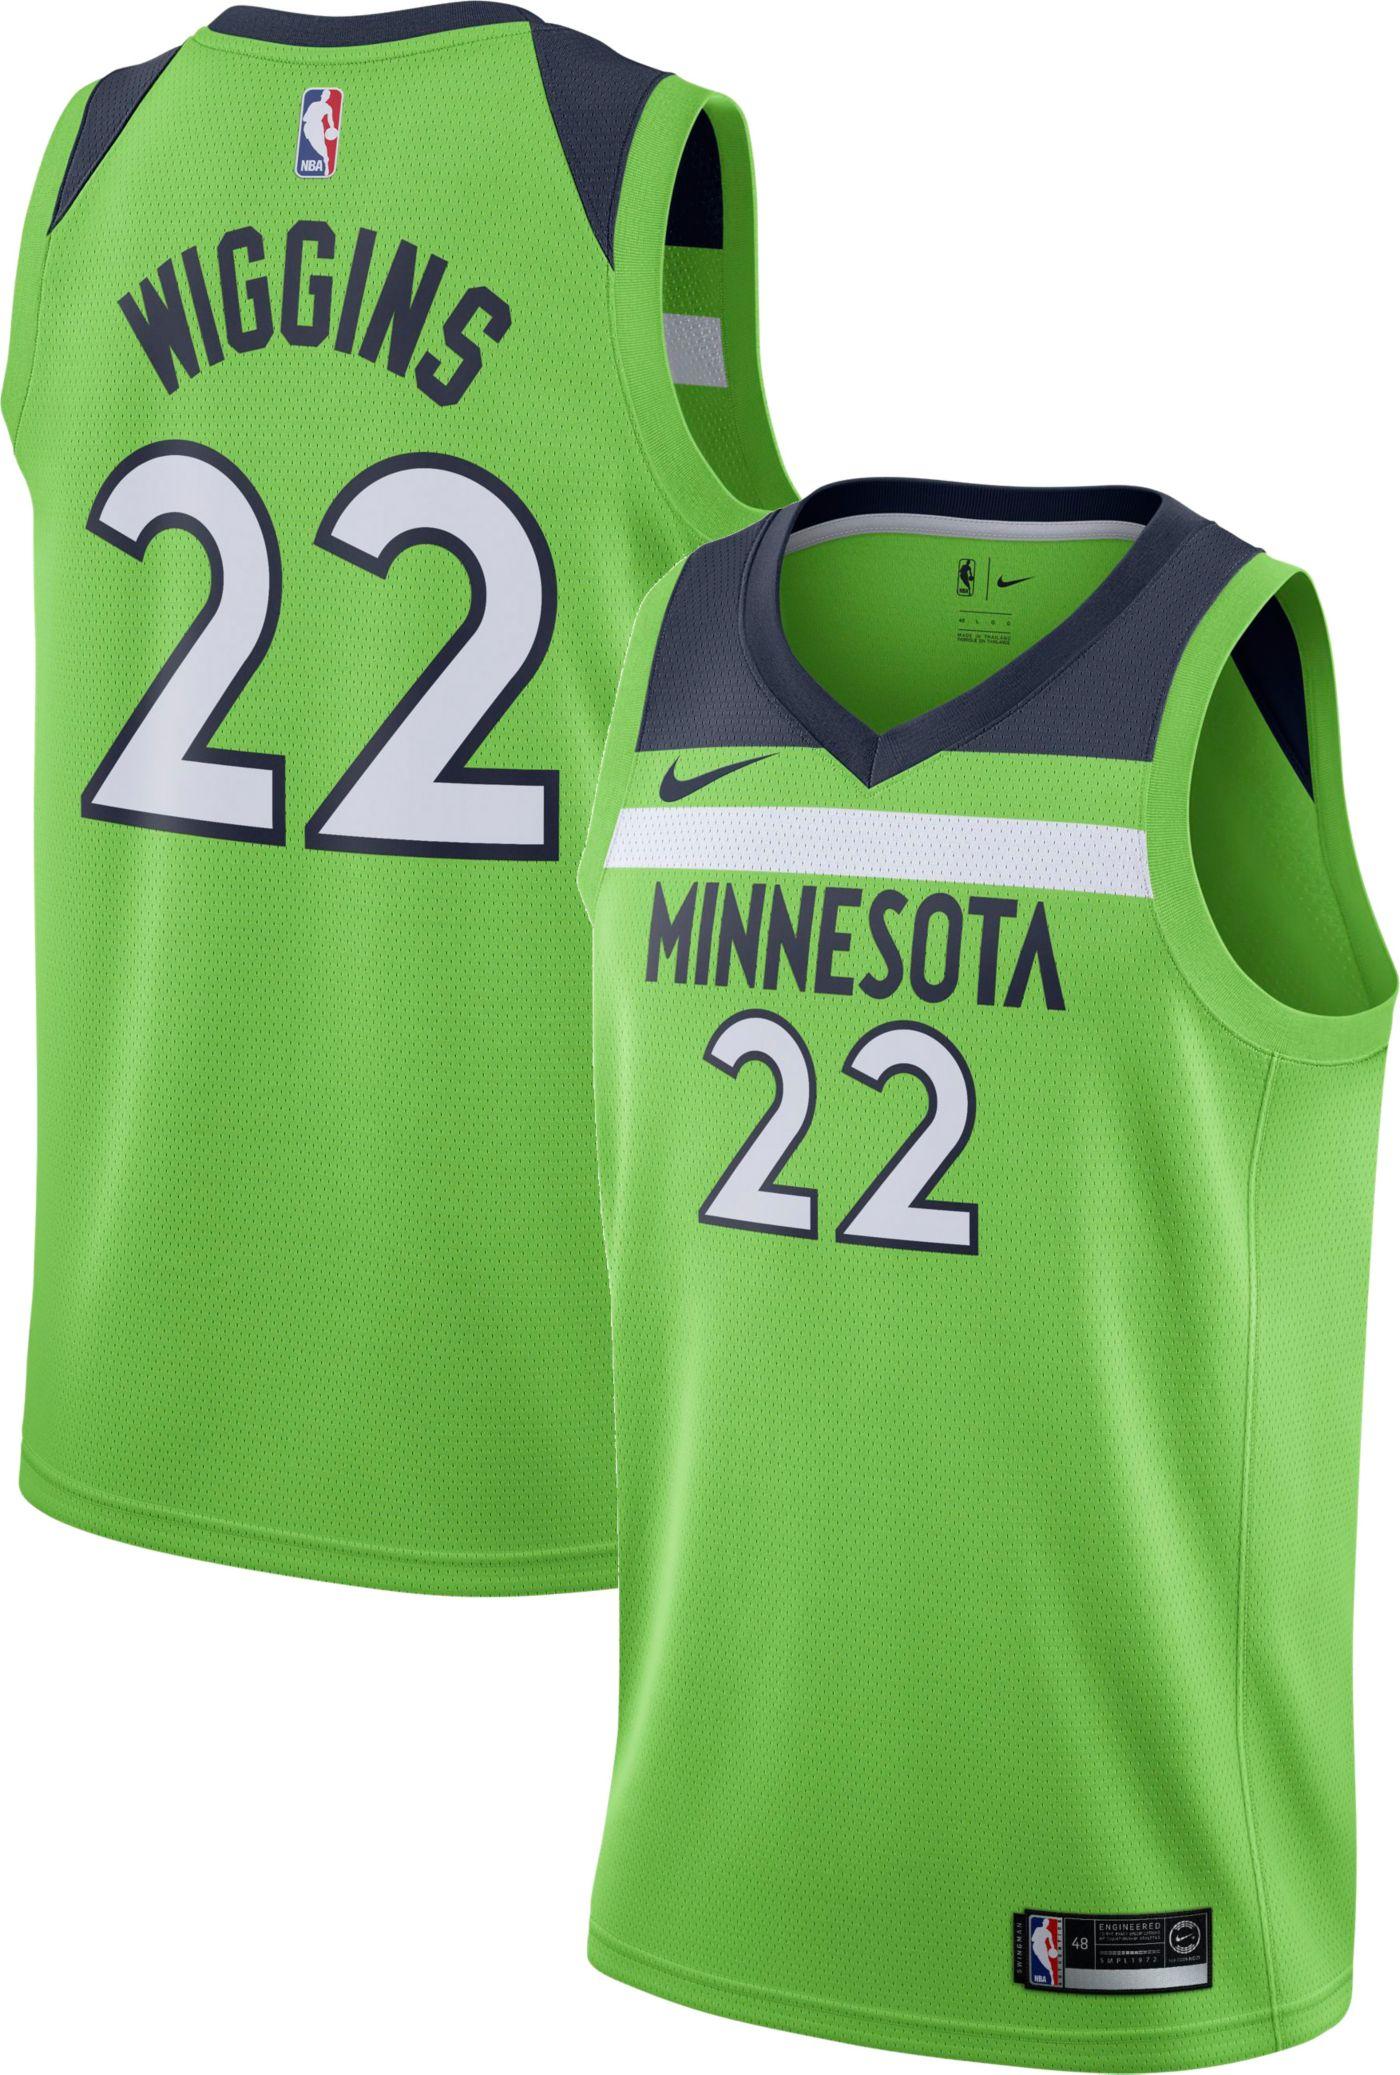 Nike Men's Minnesota Timberwolves Andrew Wiggins #22 Green Dri-FIT Statement Swingman Jersey